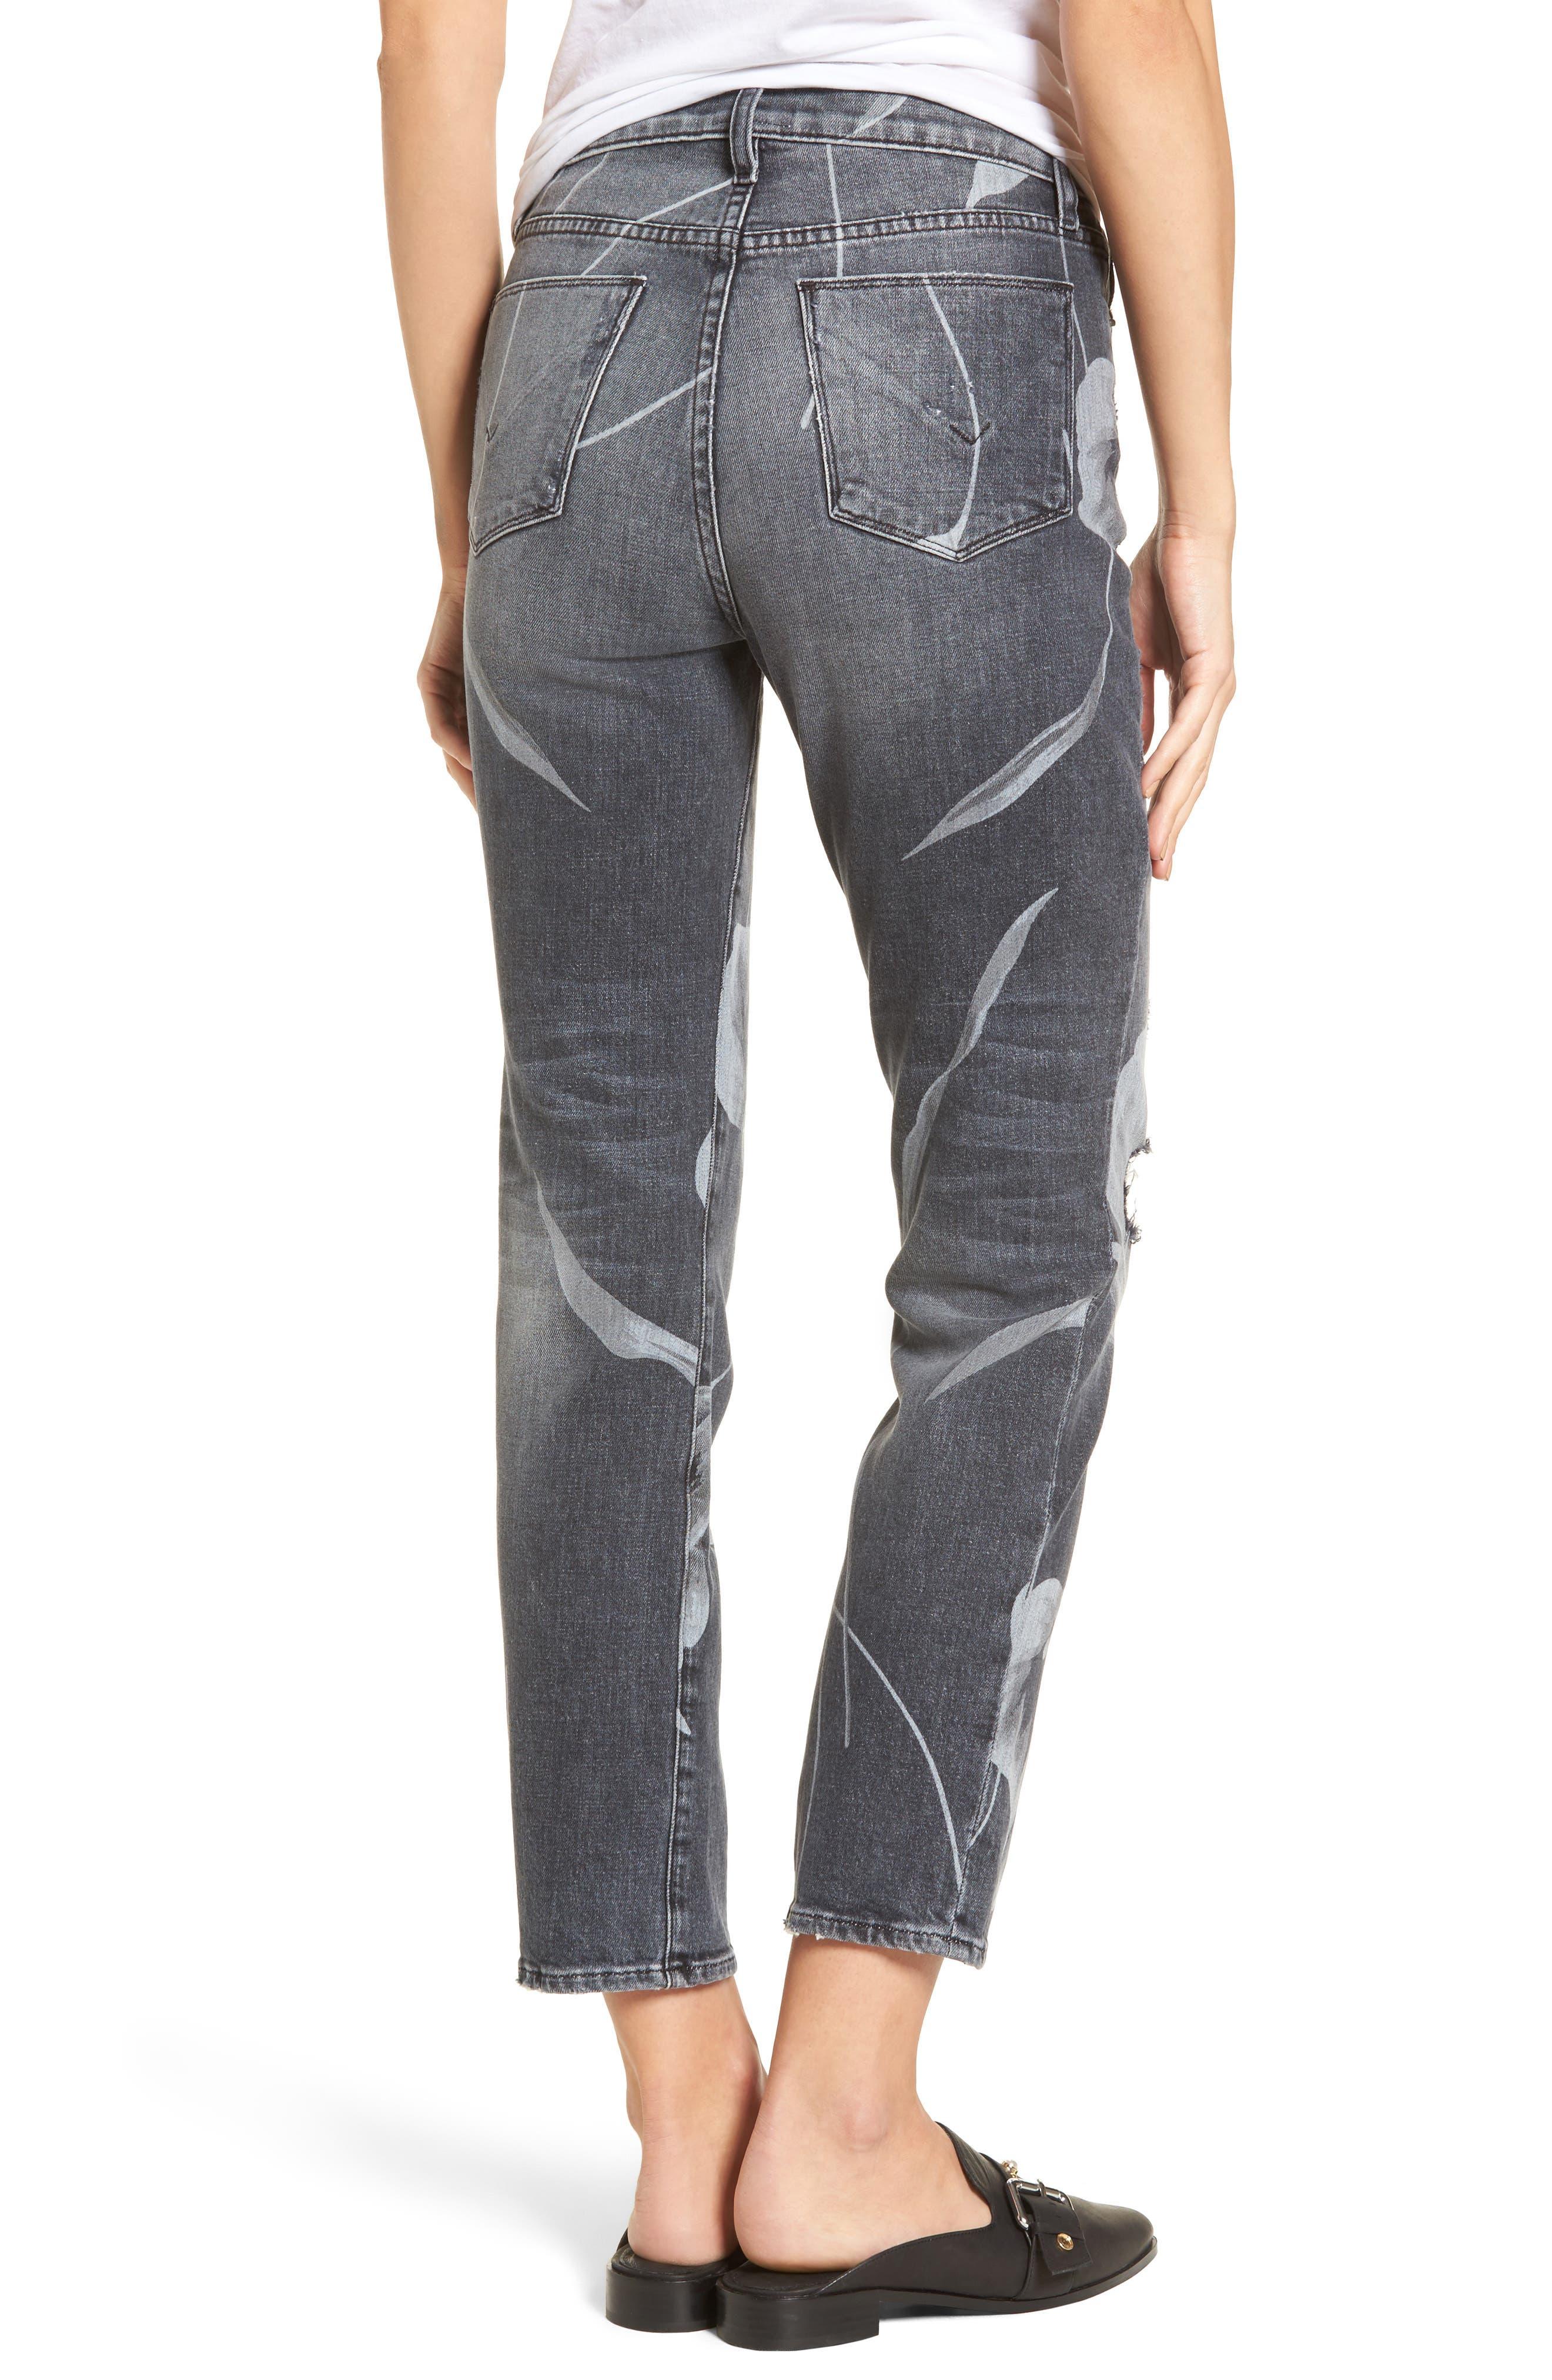 Zoeey High Waist Crop Straight Leg Jeans,                             Alternate thumbnail 2, color,                             Noir In Bloom